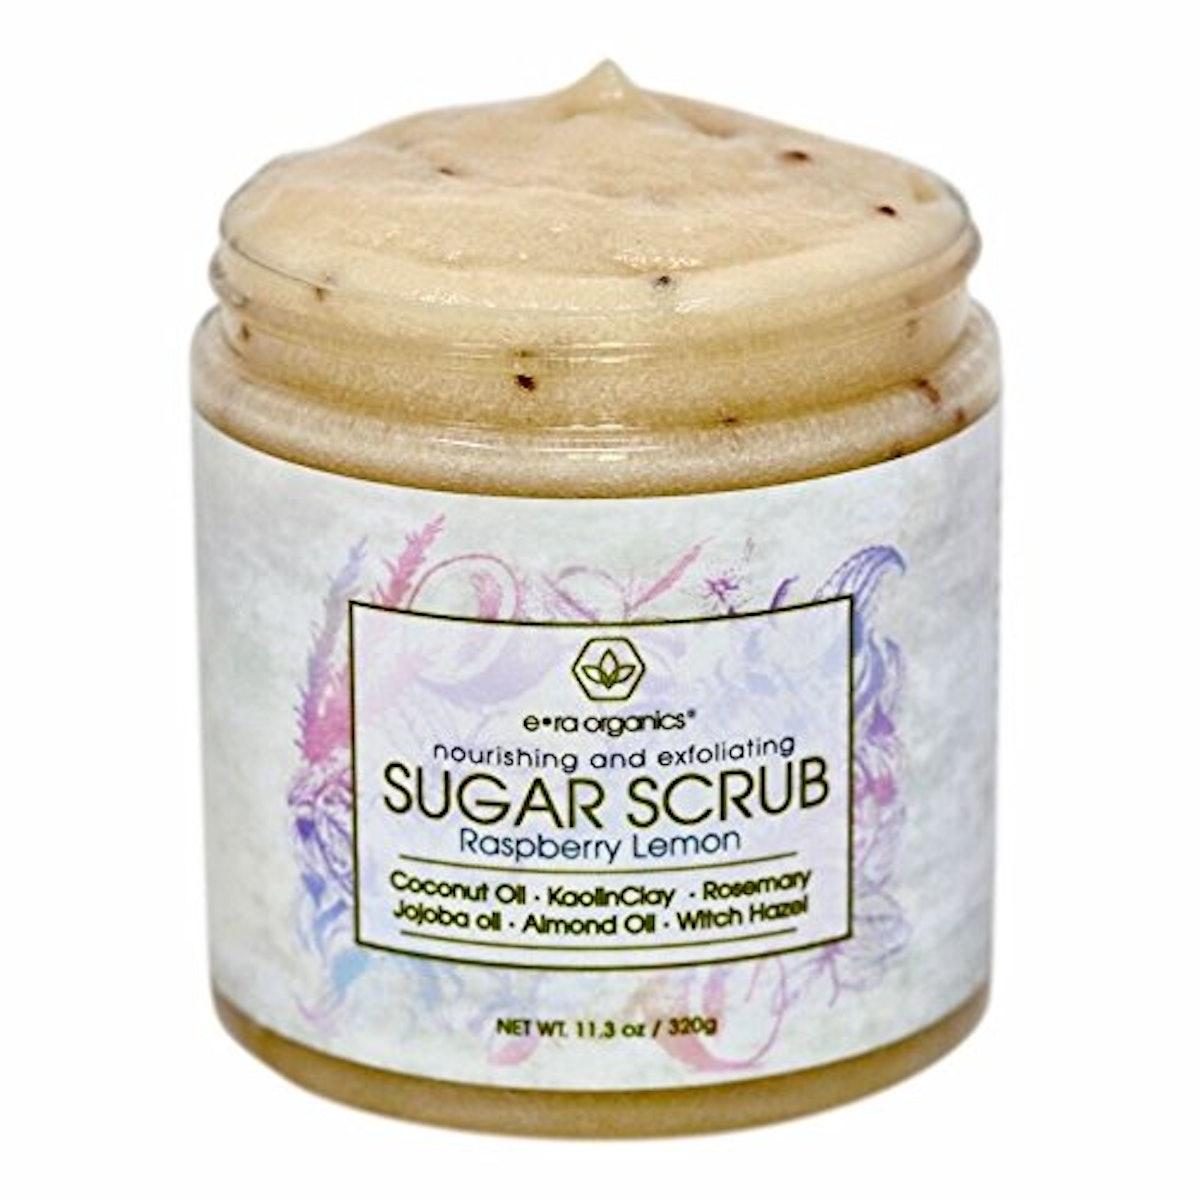 Era Organics Nourishing and Exfoliating Sugar Scrub